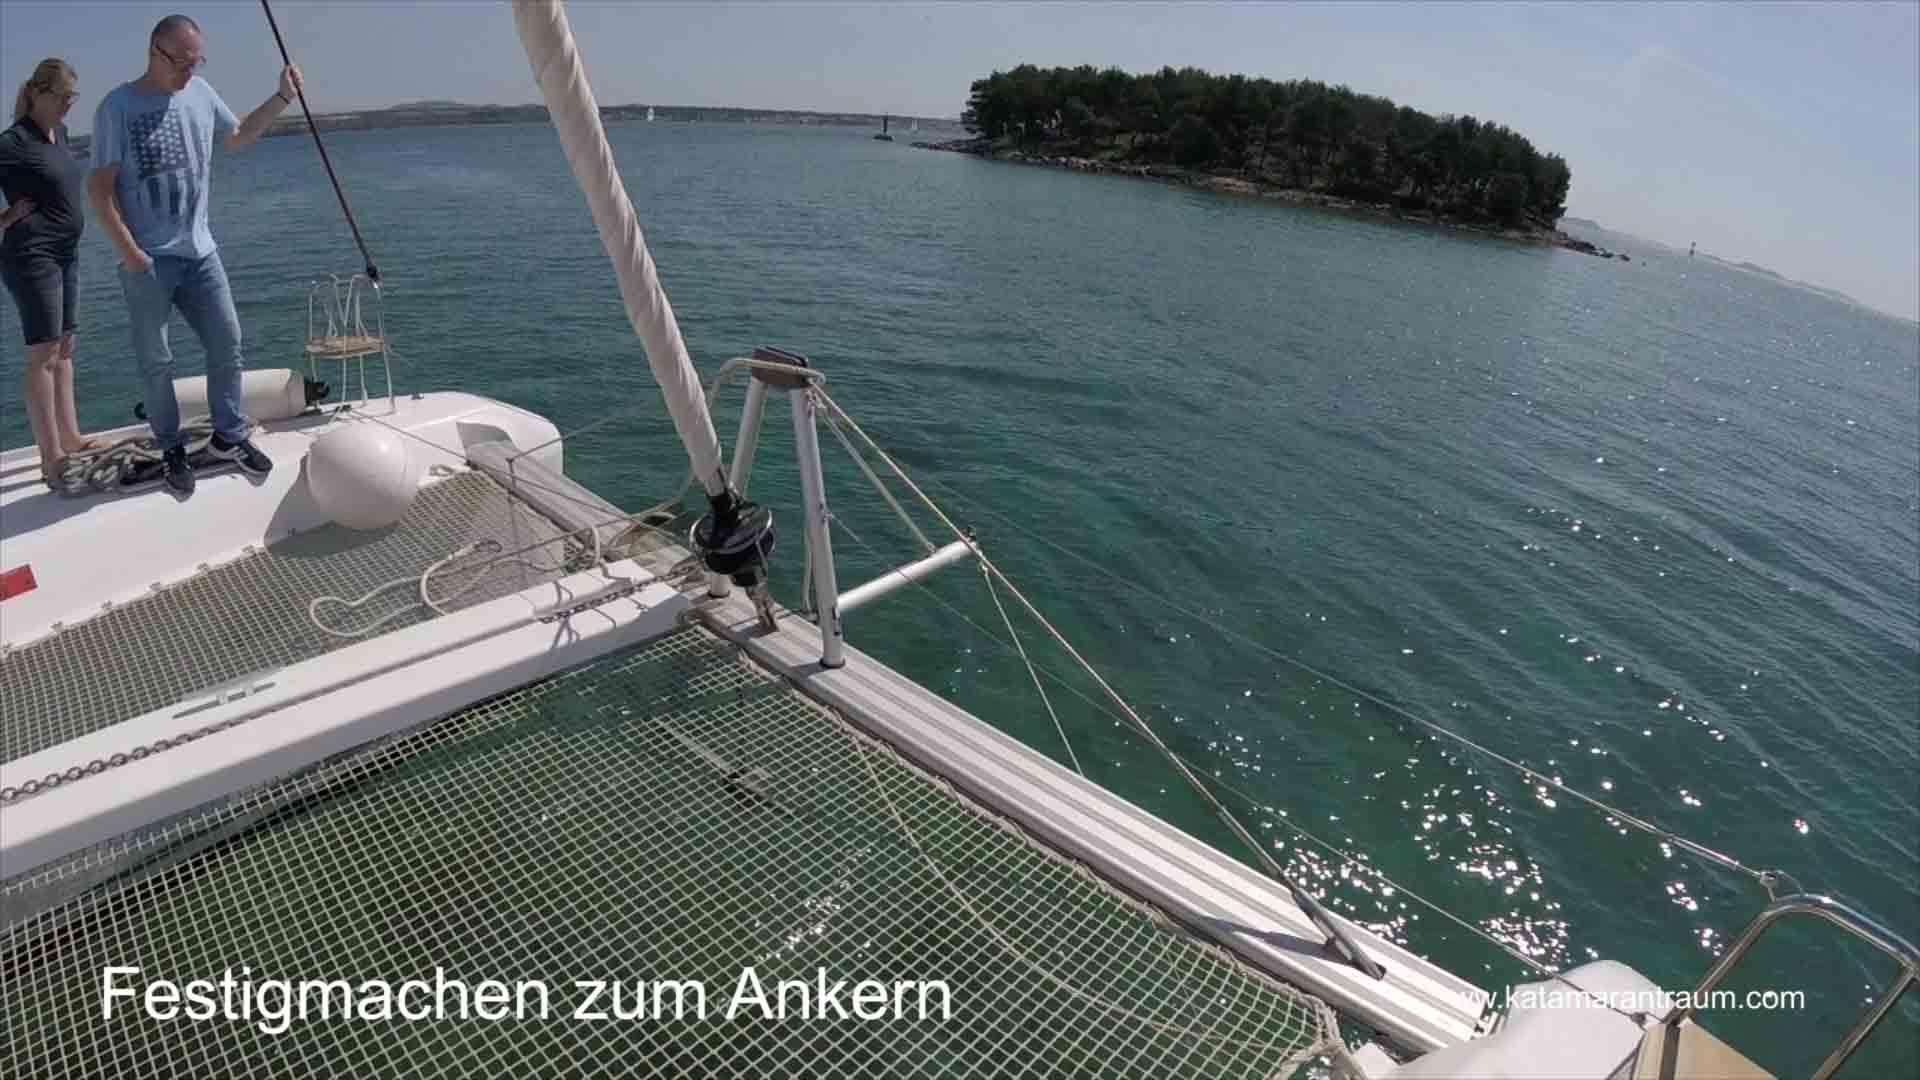 Preparation for anchoring during catamaran training